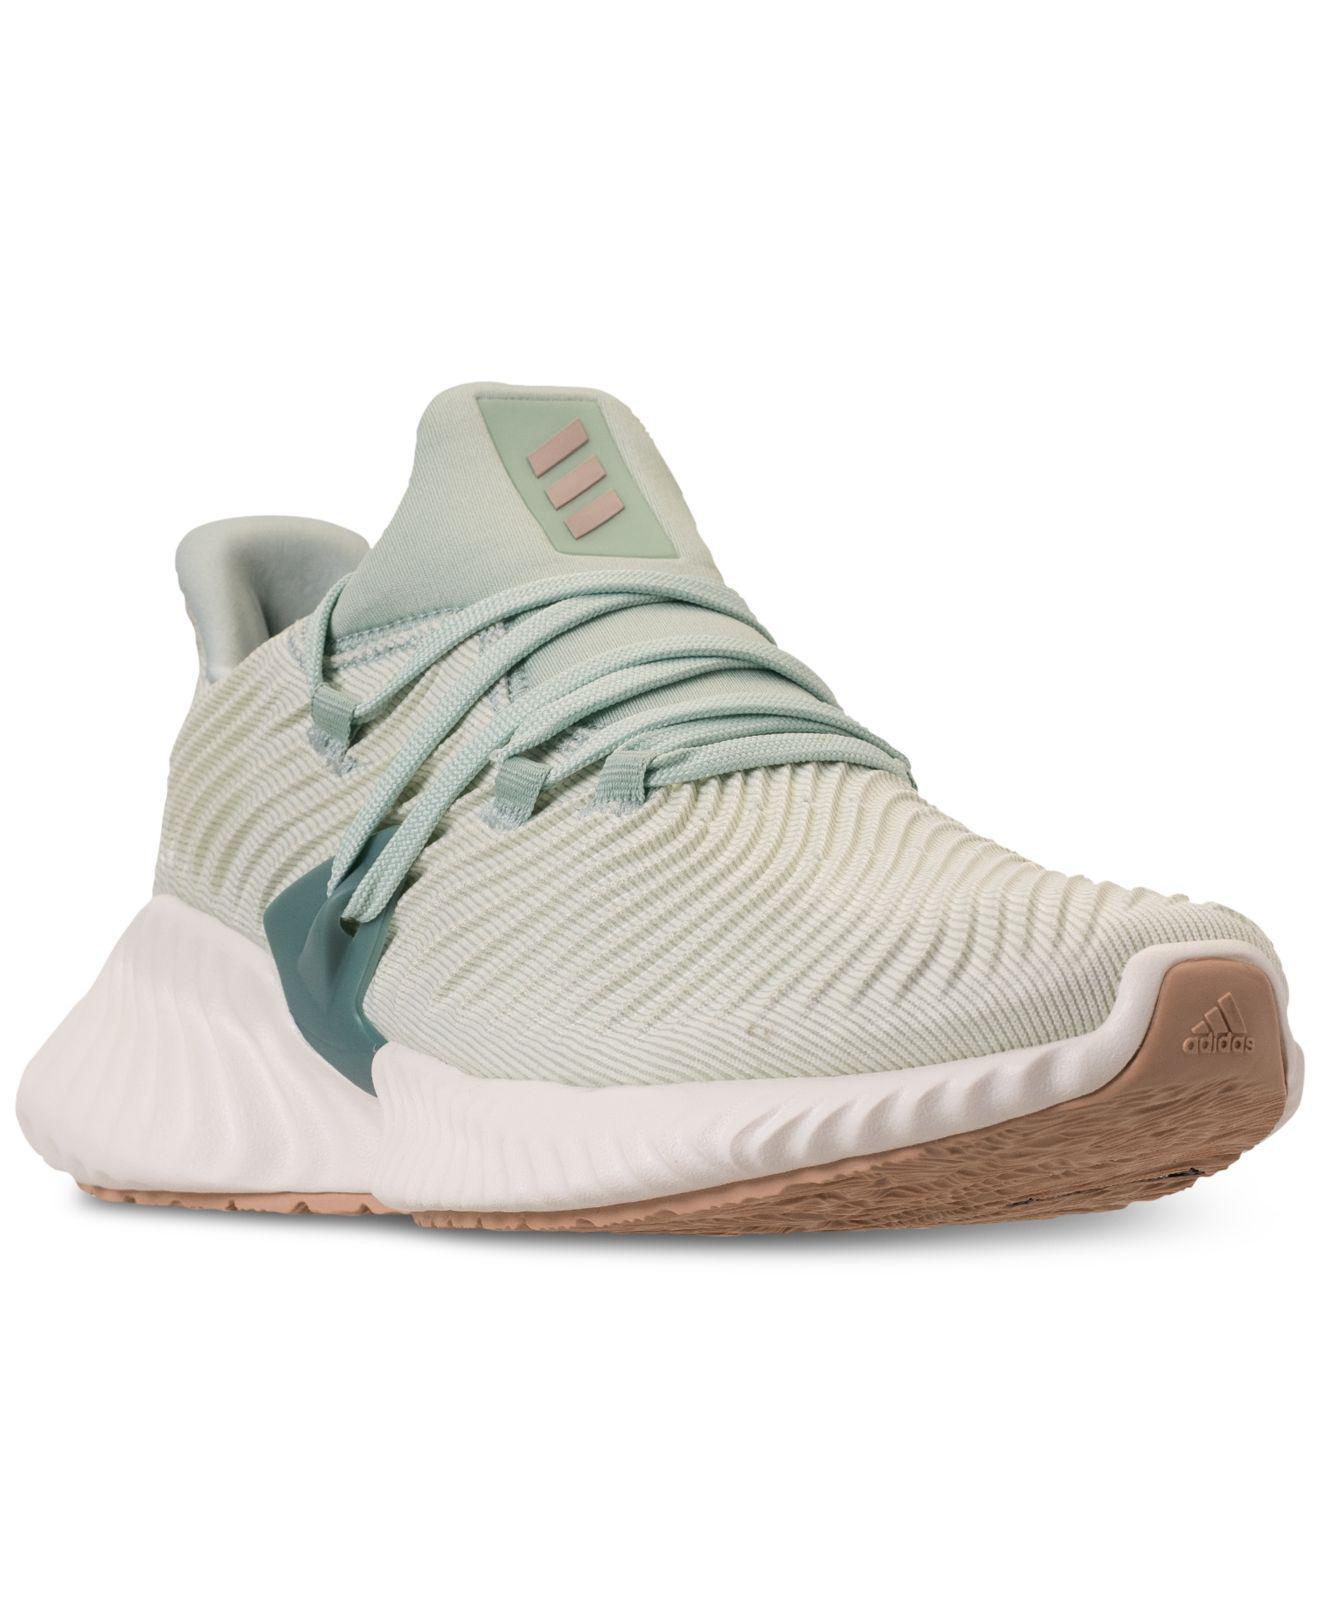 Alphabounce Instinct Running Sneakers